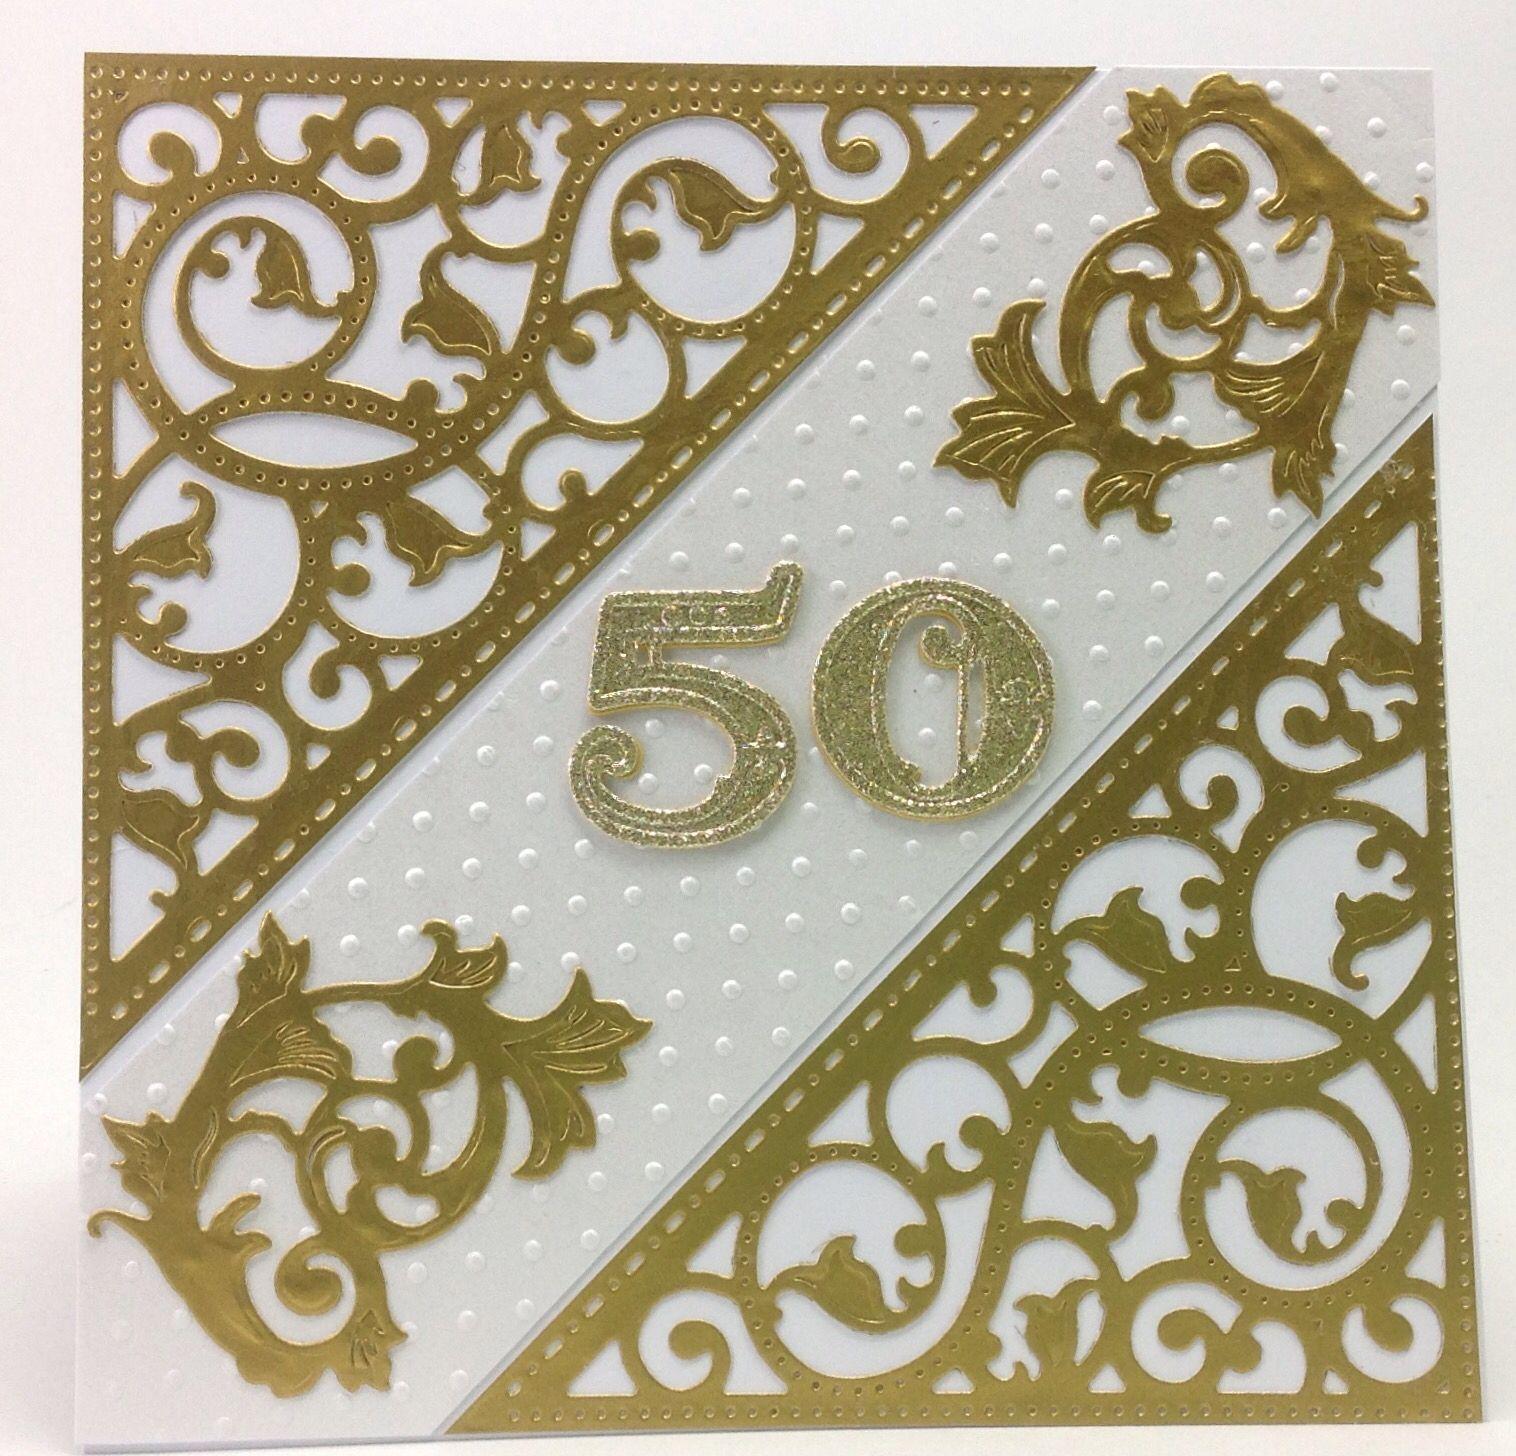 jubilee card 50th anniversary gold elements spellbinders